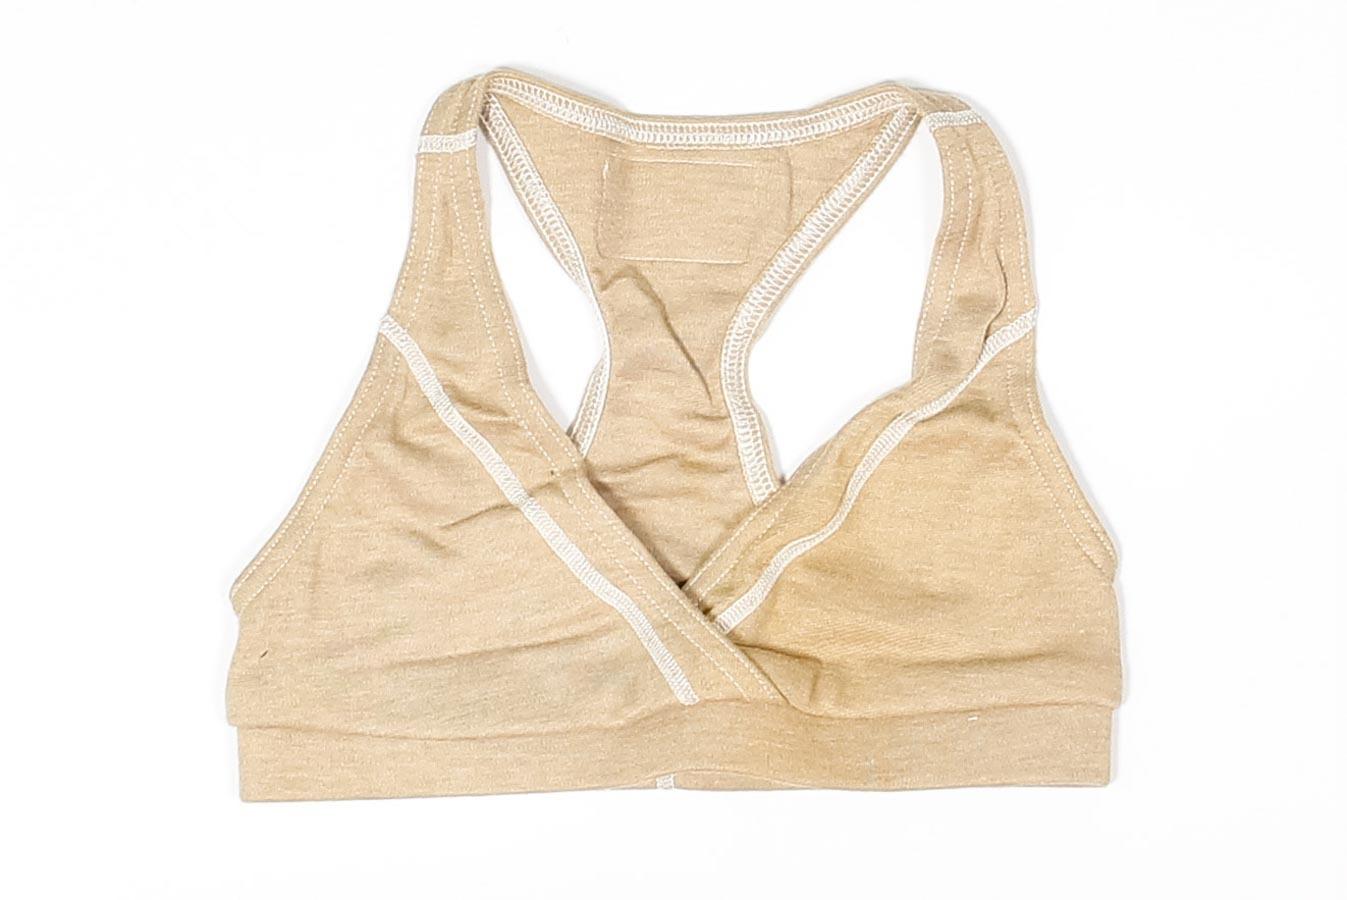 Pxp Racewear Underwear Fire Resistant Bra Tan Medium